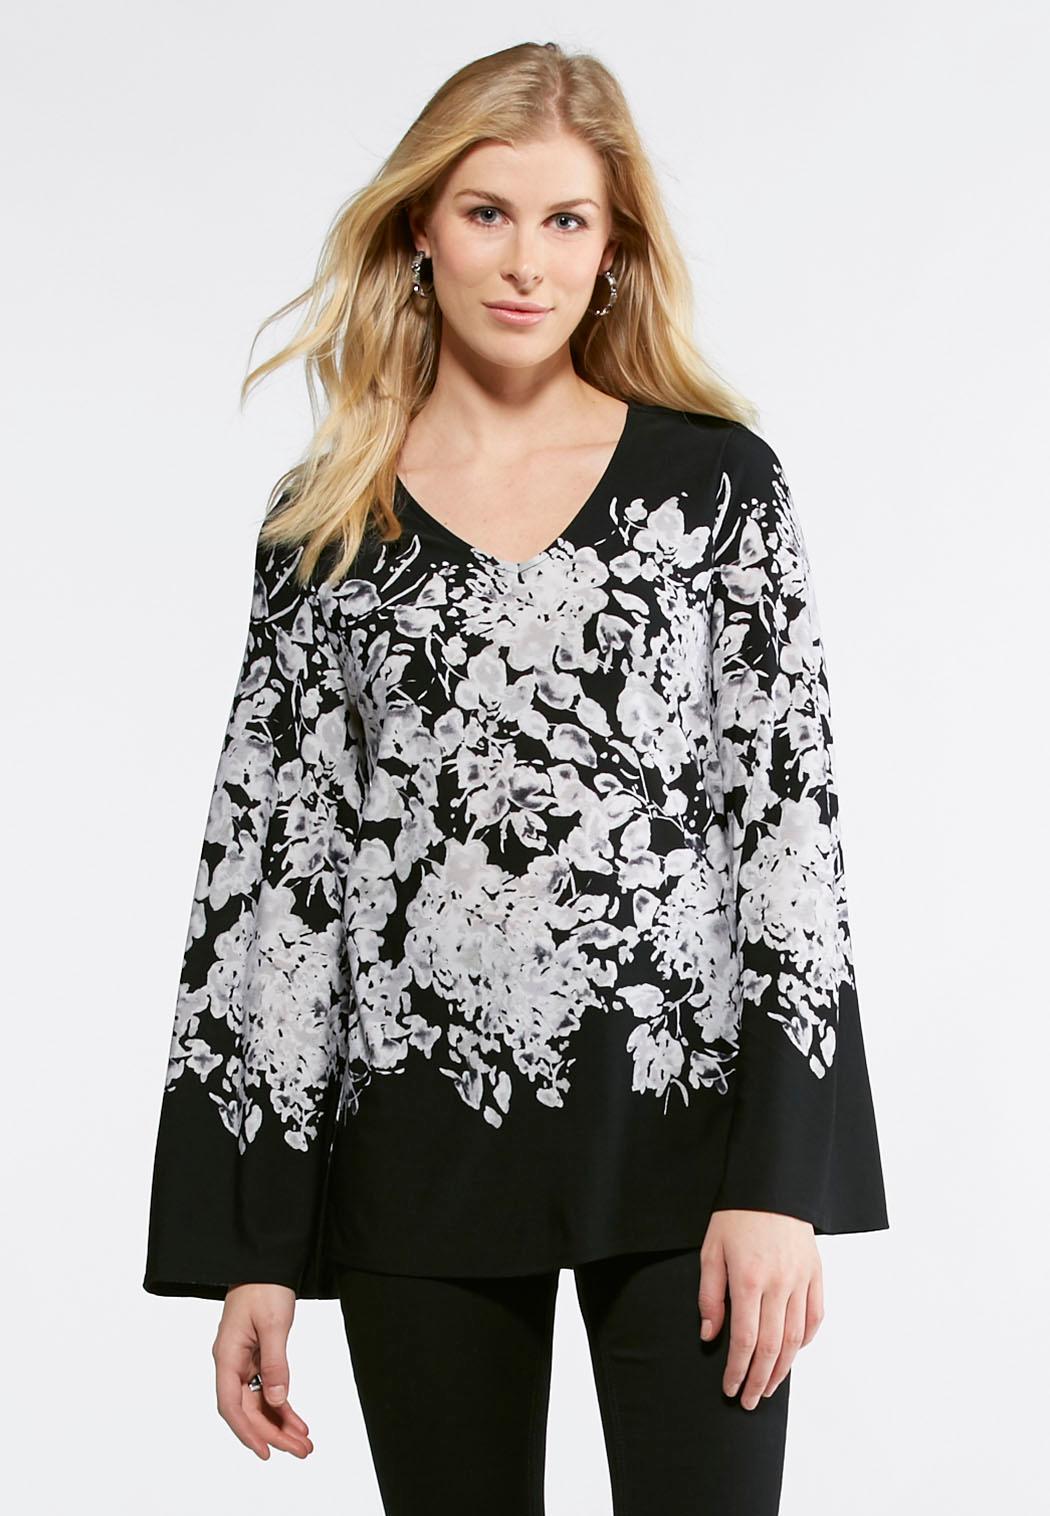 Plus Size Tunic Sweaters